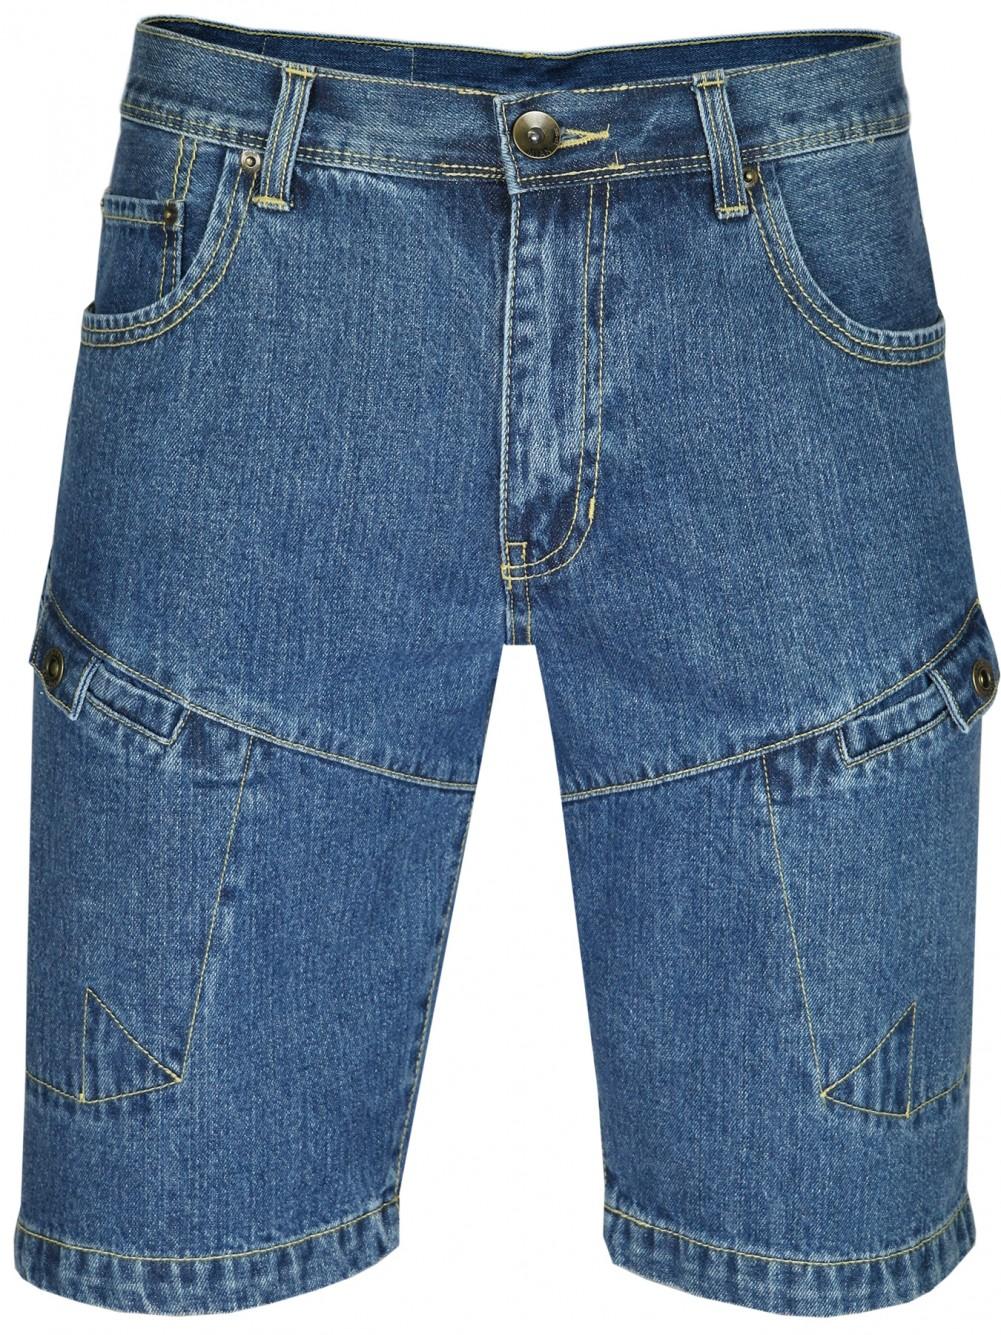 MIAN Denim Herren Shorts Jeans-Shorts 100% Baumwolle Blue